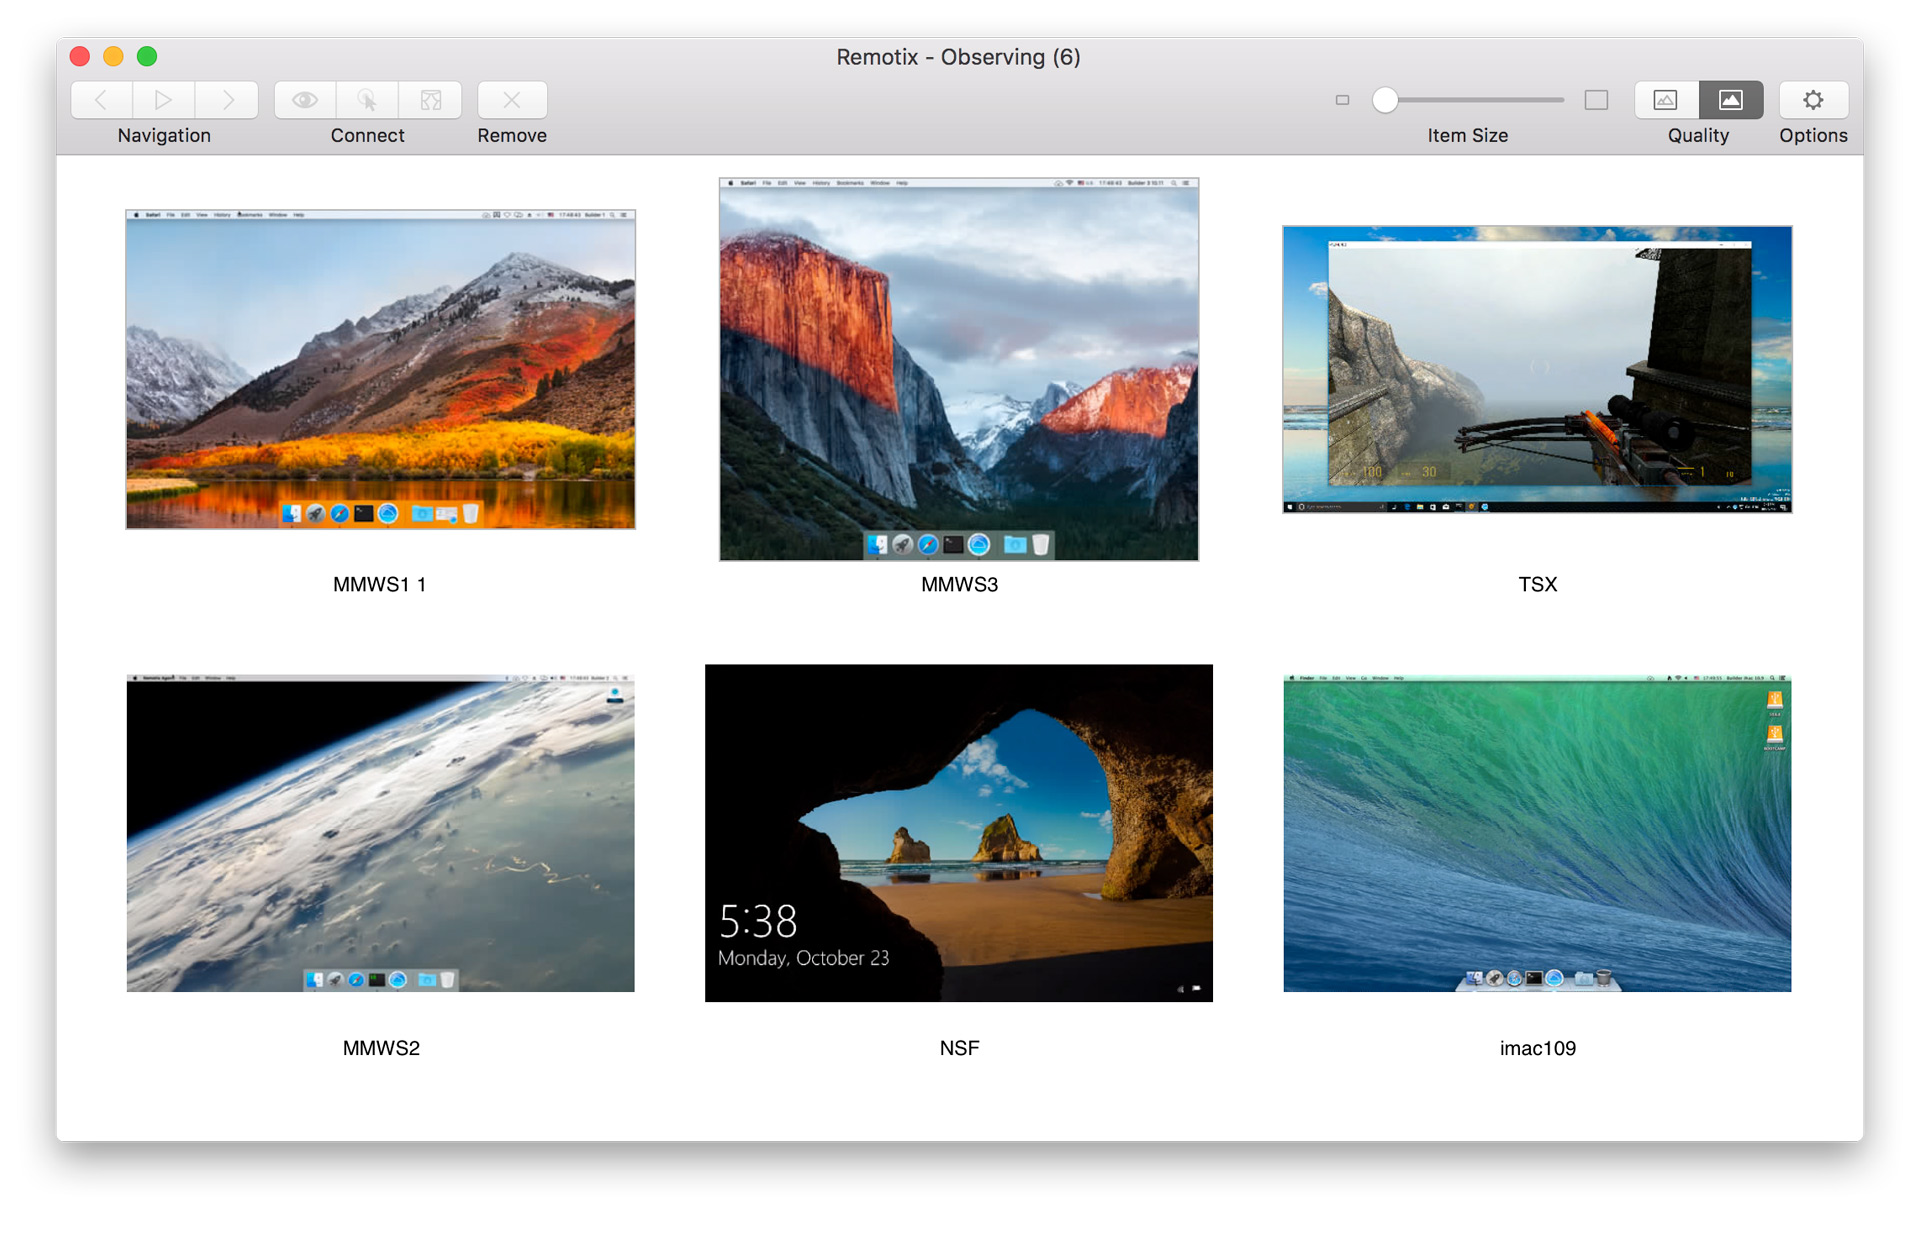 Nulana - Remotix for Mac